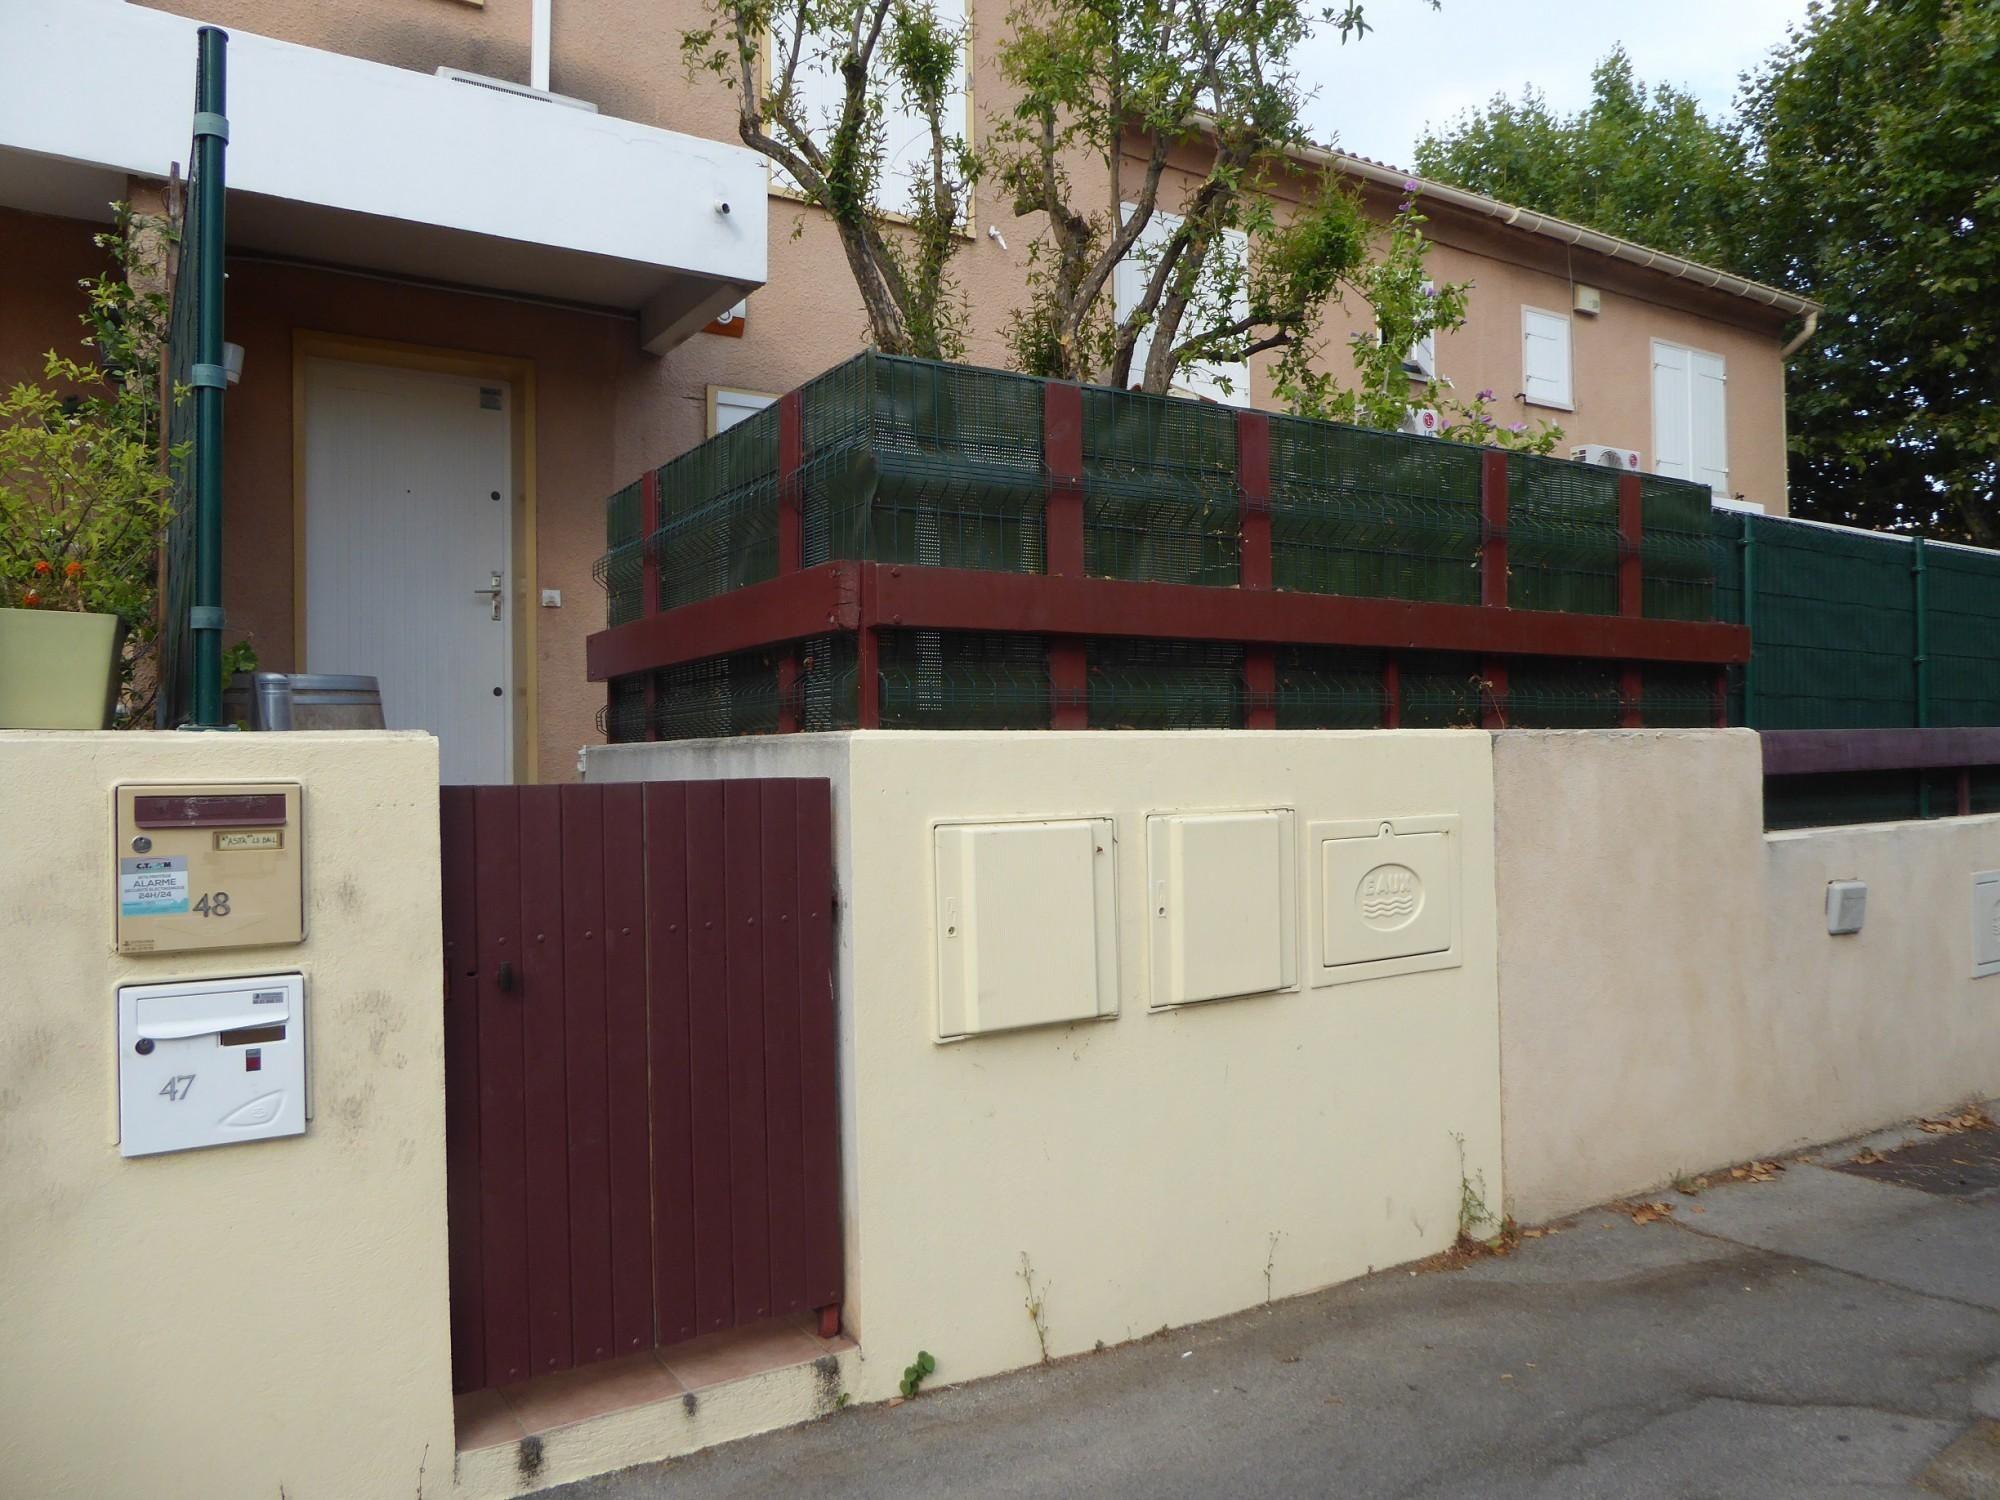 Location Villa Meublee Plan De Cuques Proximite 4